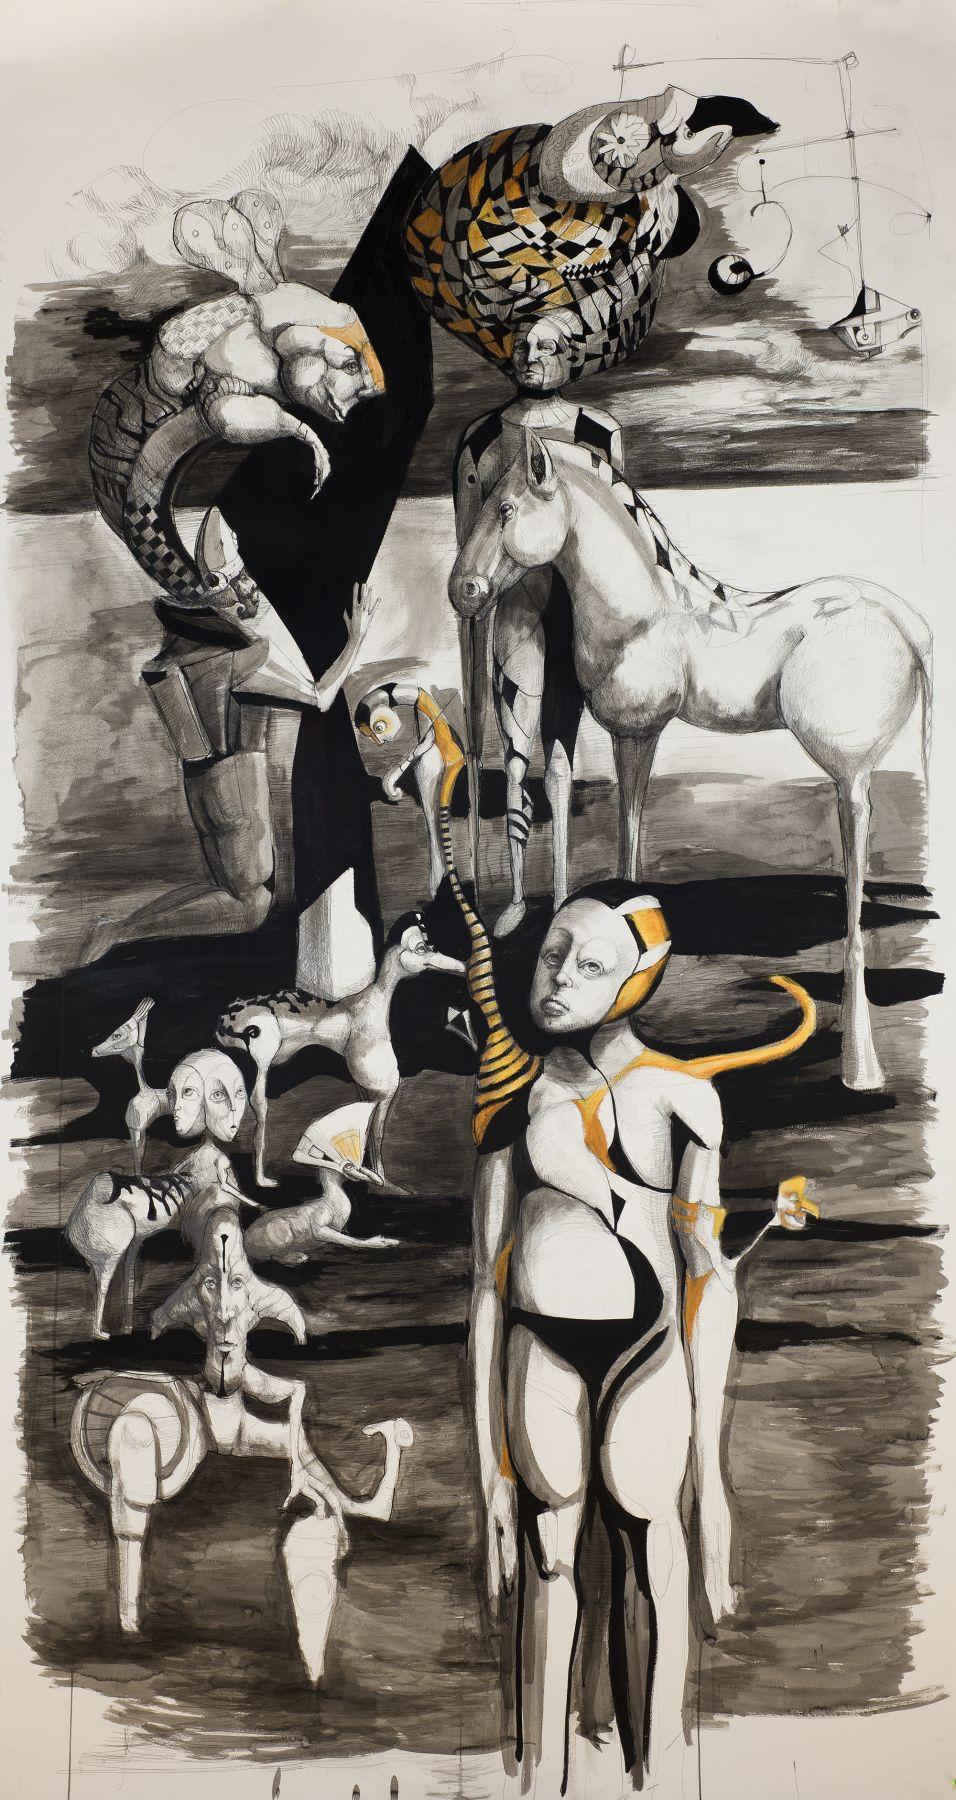 Untitled by Kremena Lefterova